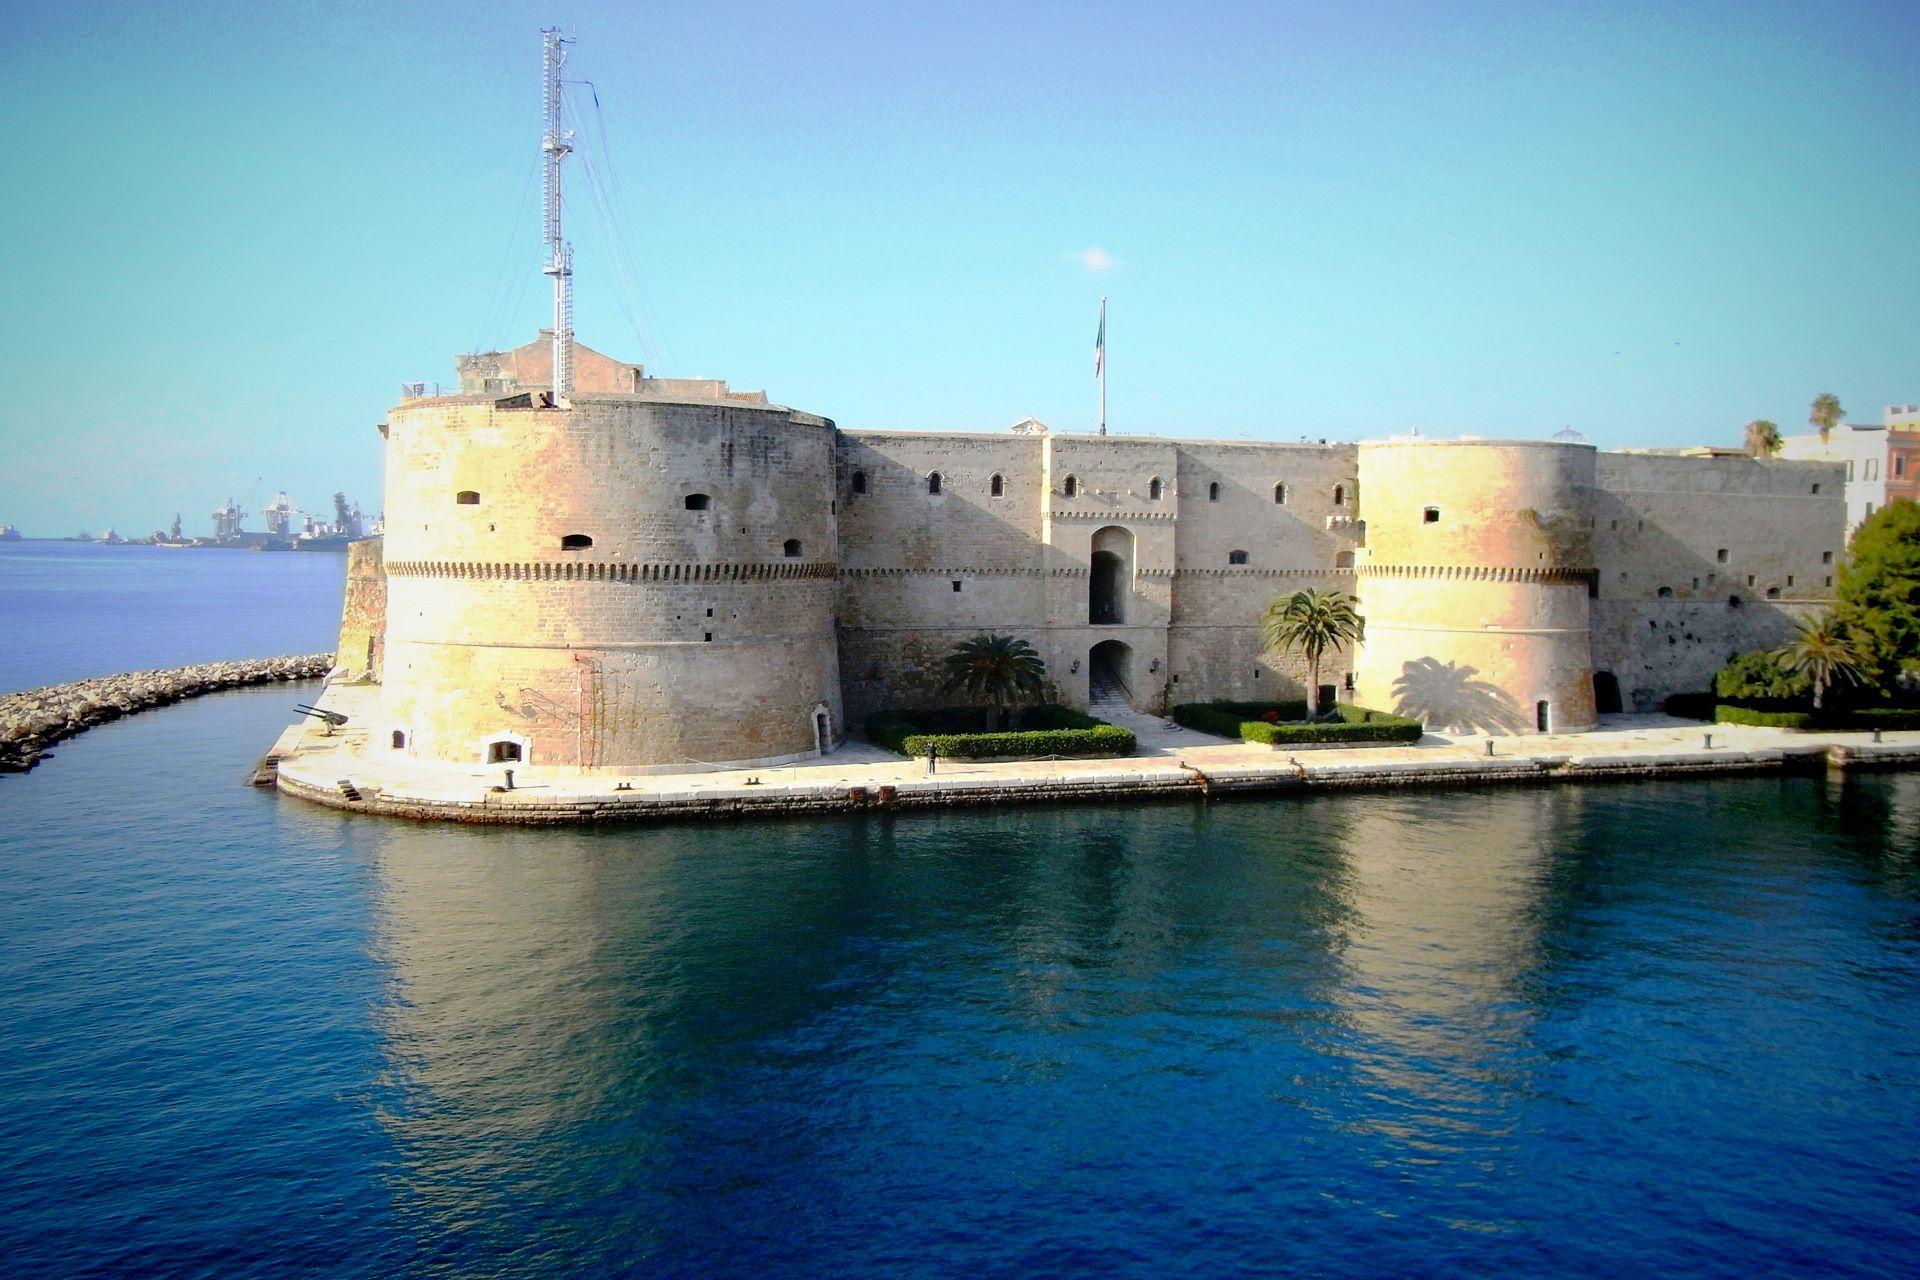 apulia-slow-travel-taranto-castello aragonese-medioevo-castle-aragonesische burg-due mari-zwei meere-magna grecia-grossgriechenland-magna graecia